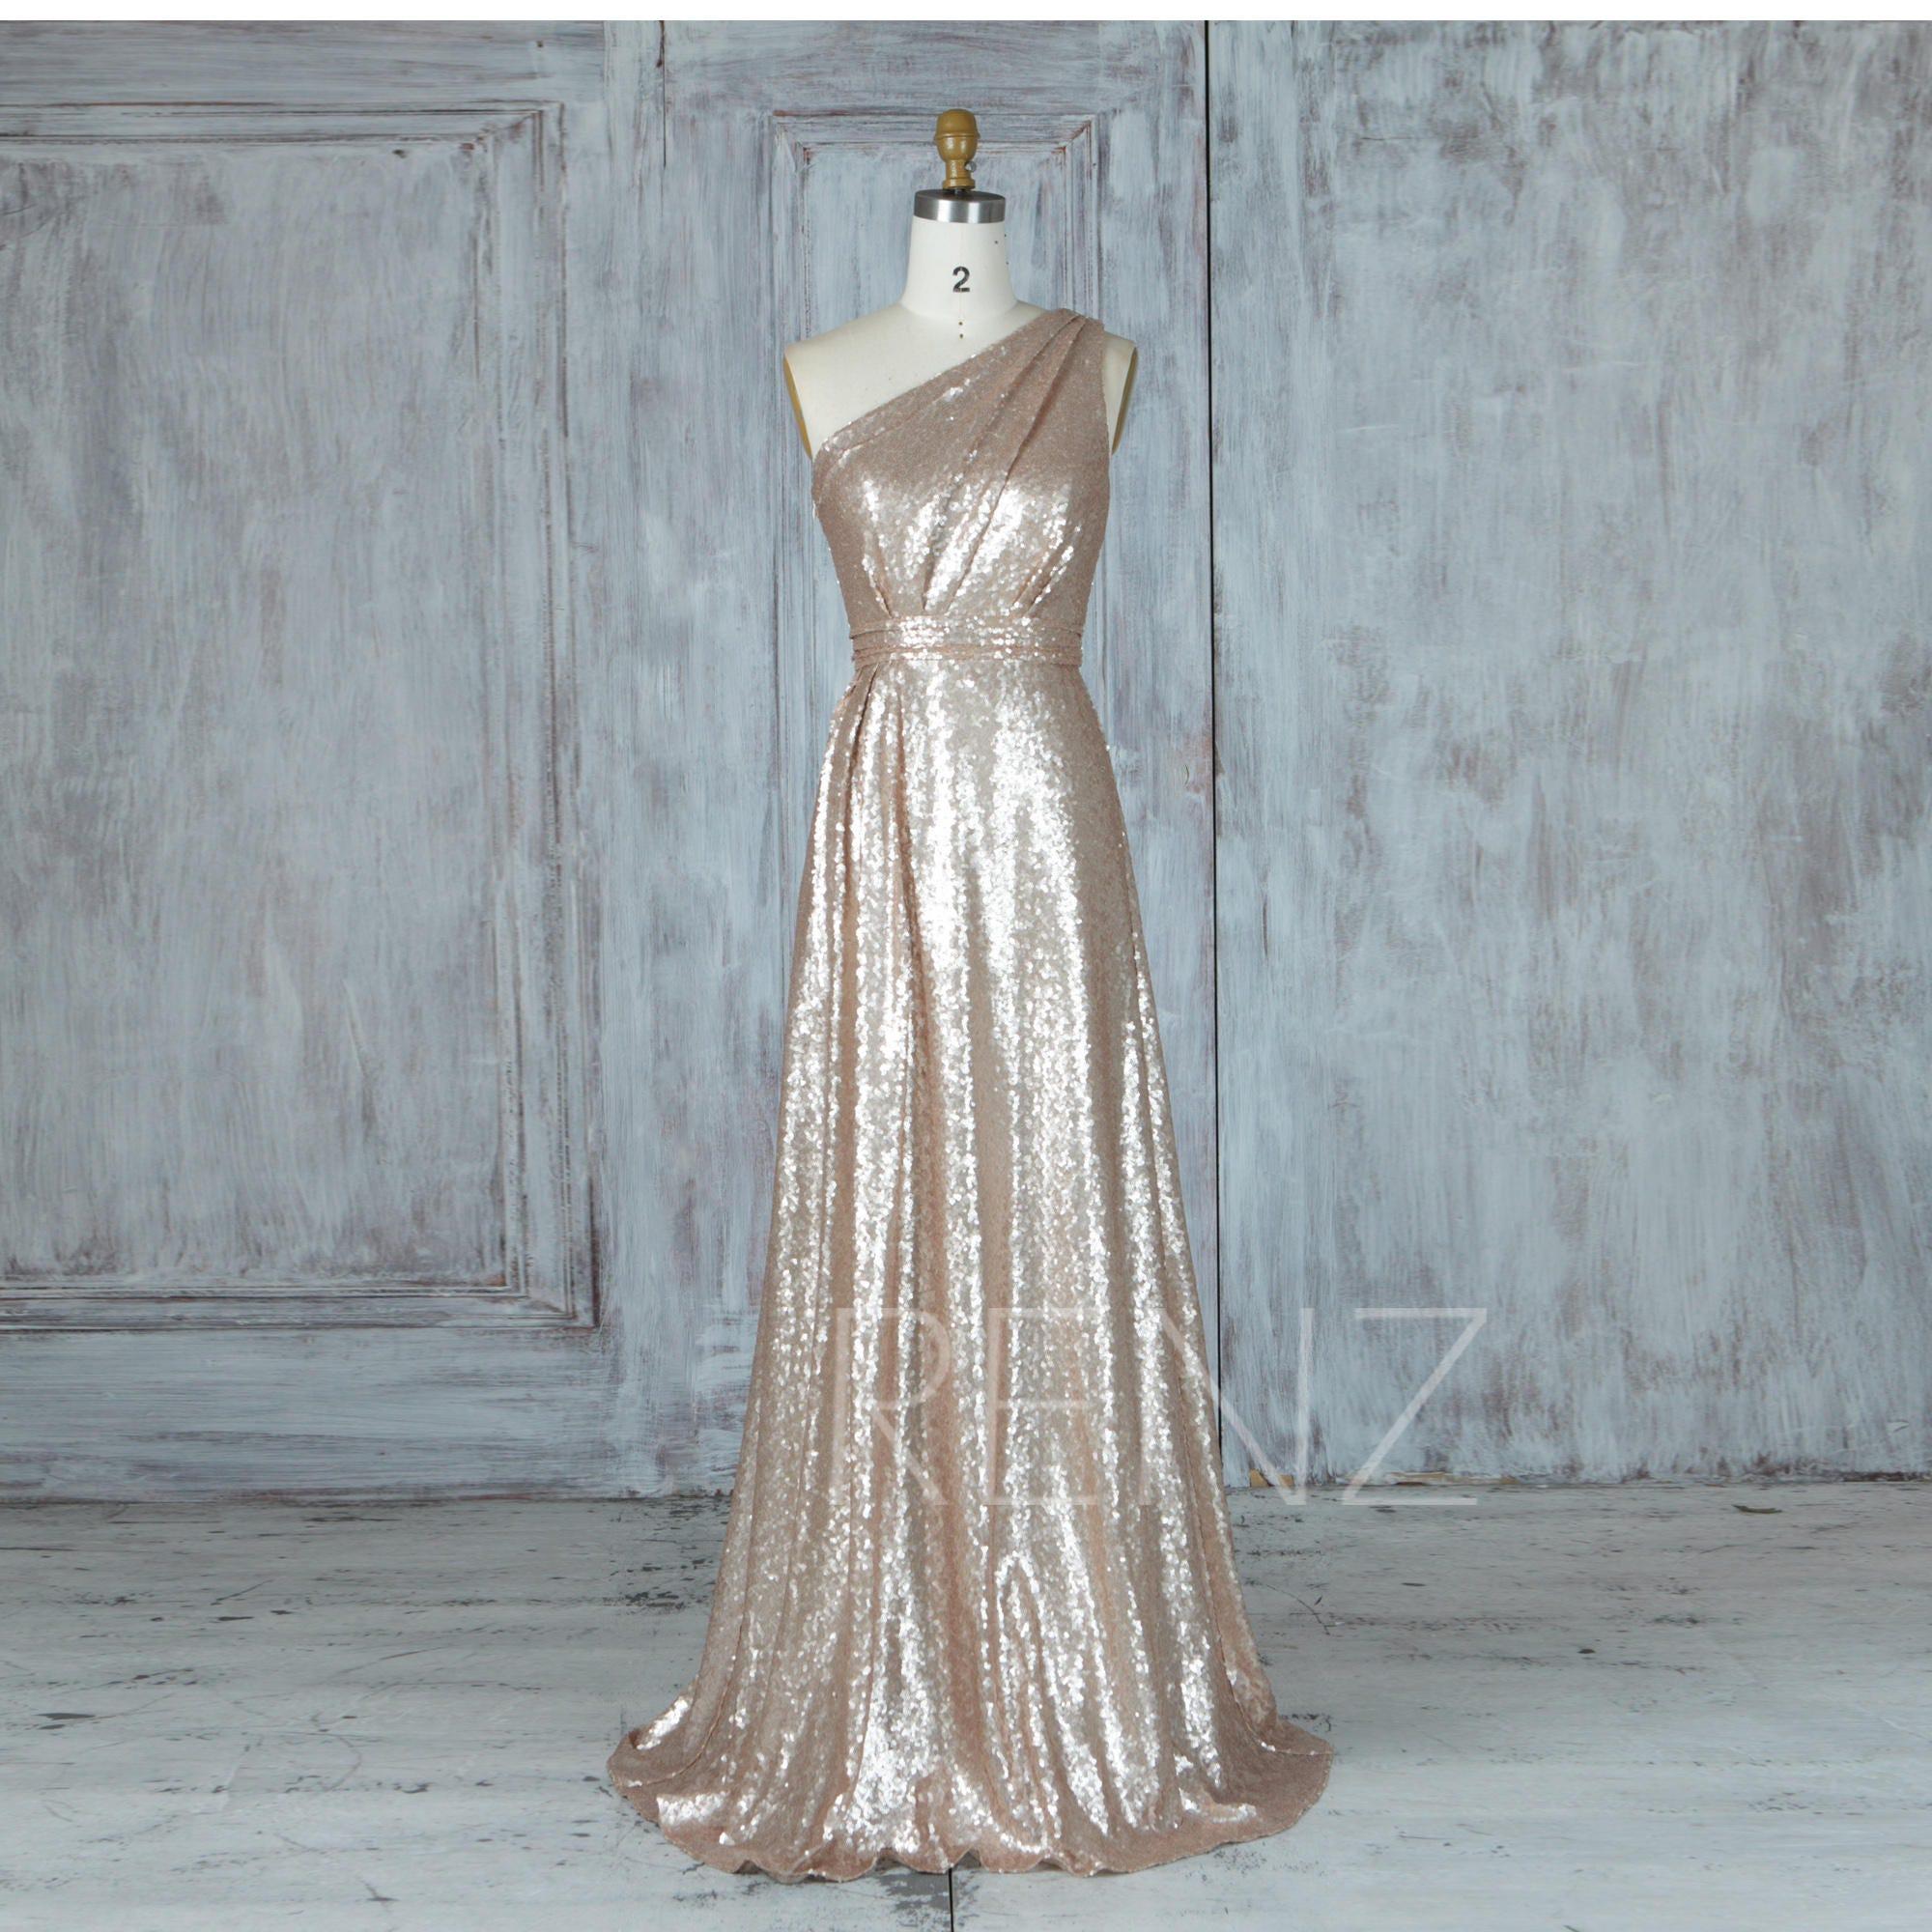 Bridesmaid Dress Tan Sequin Wedding DressRuched One Shoulder